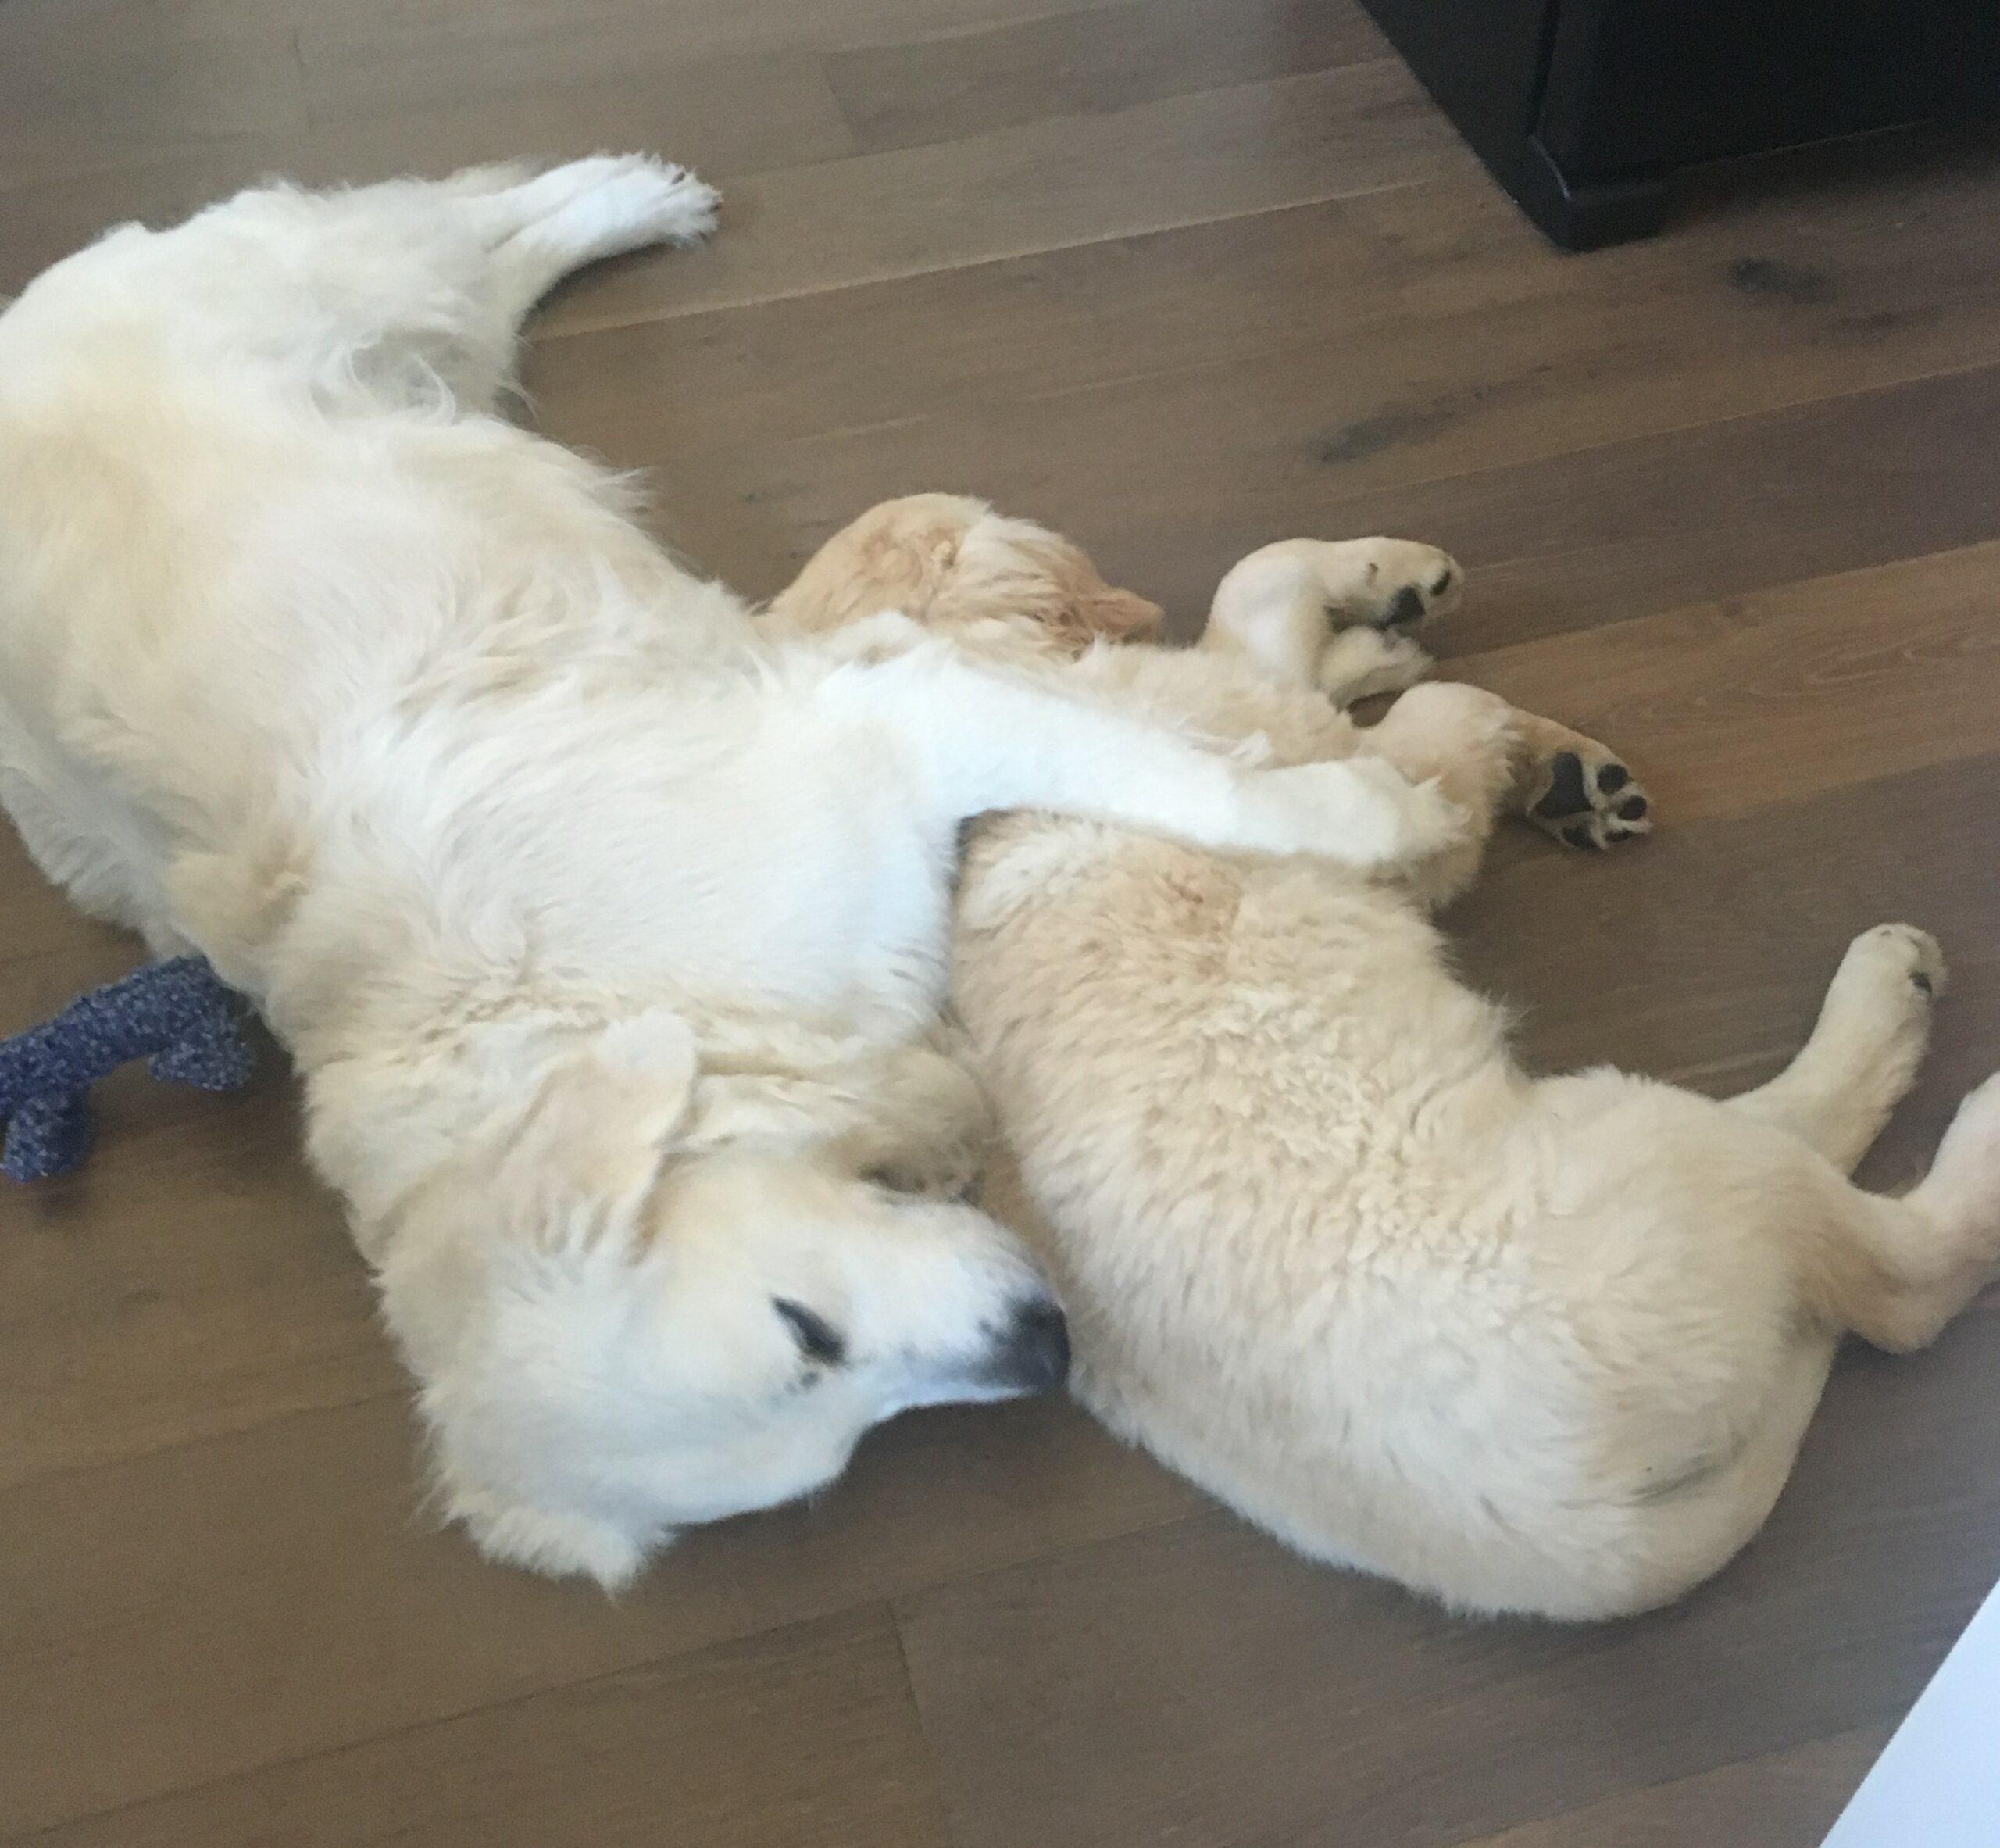 2 dogs sleeping